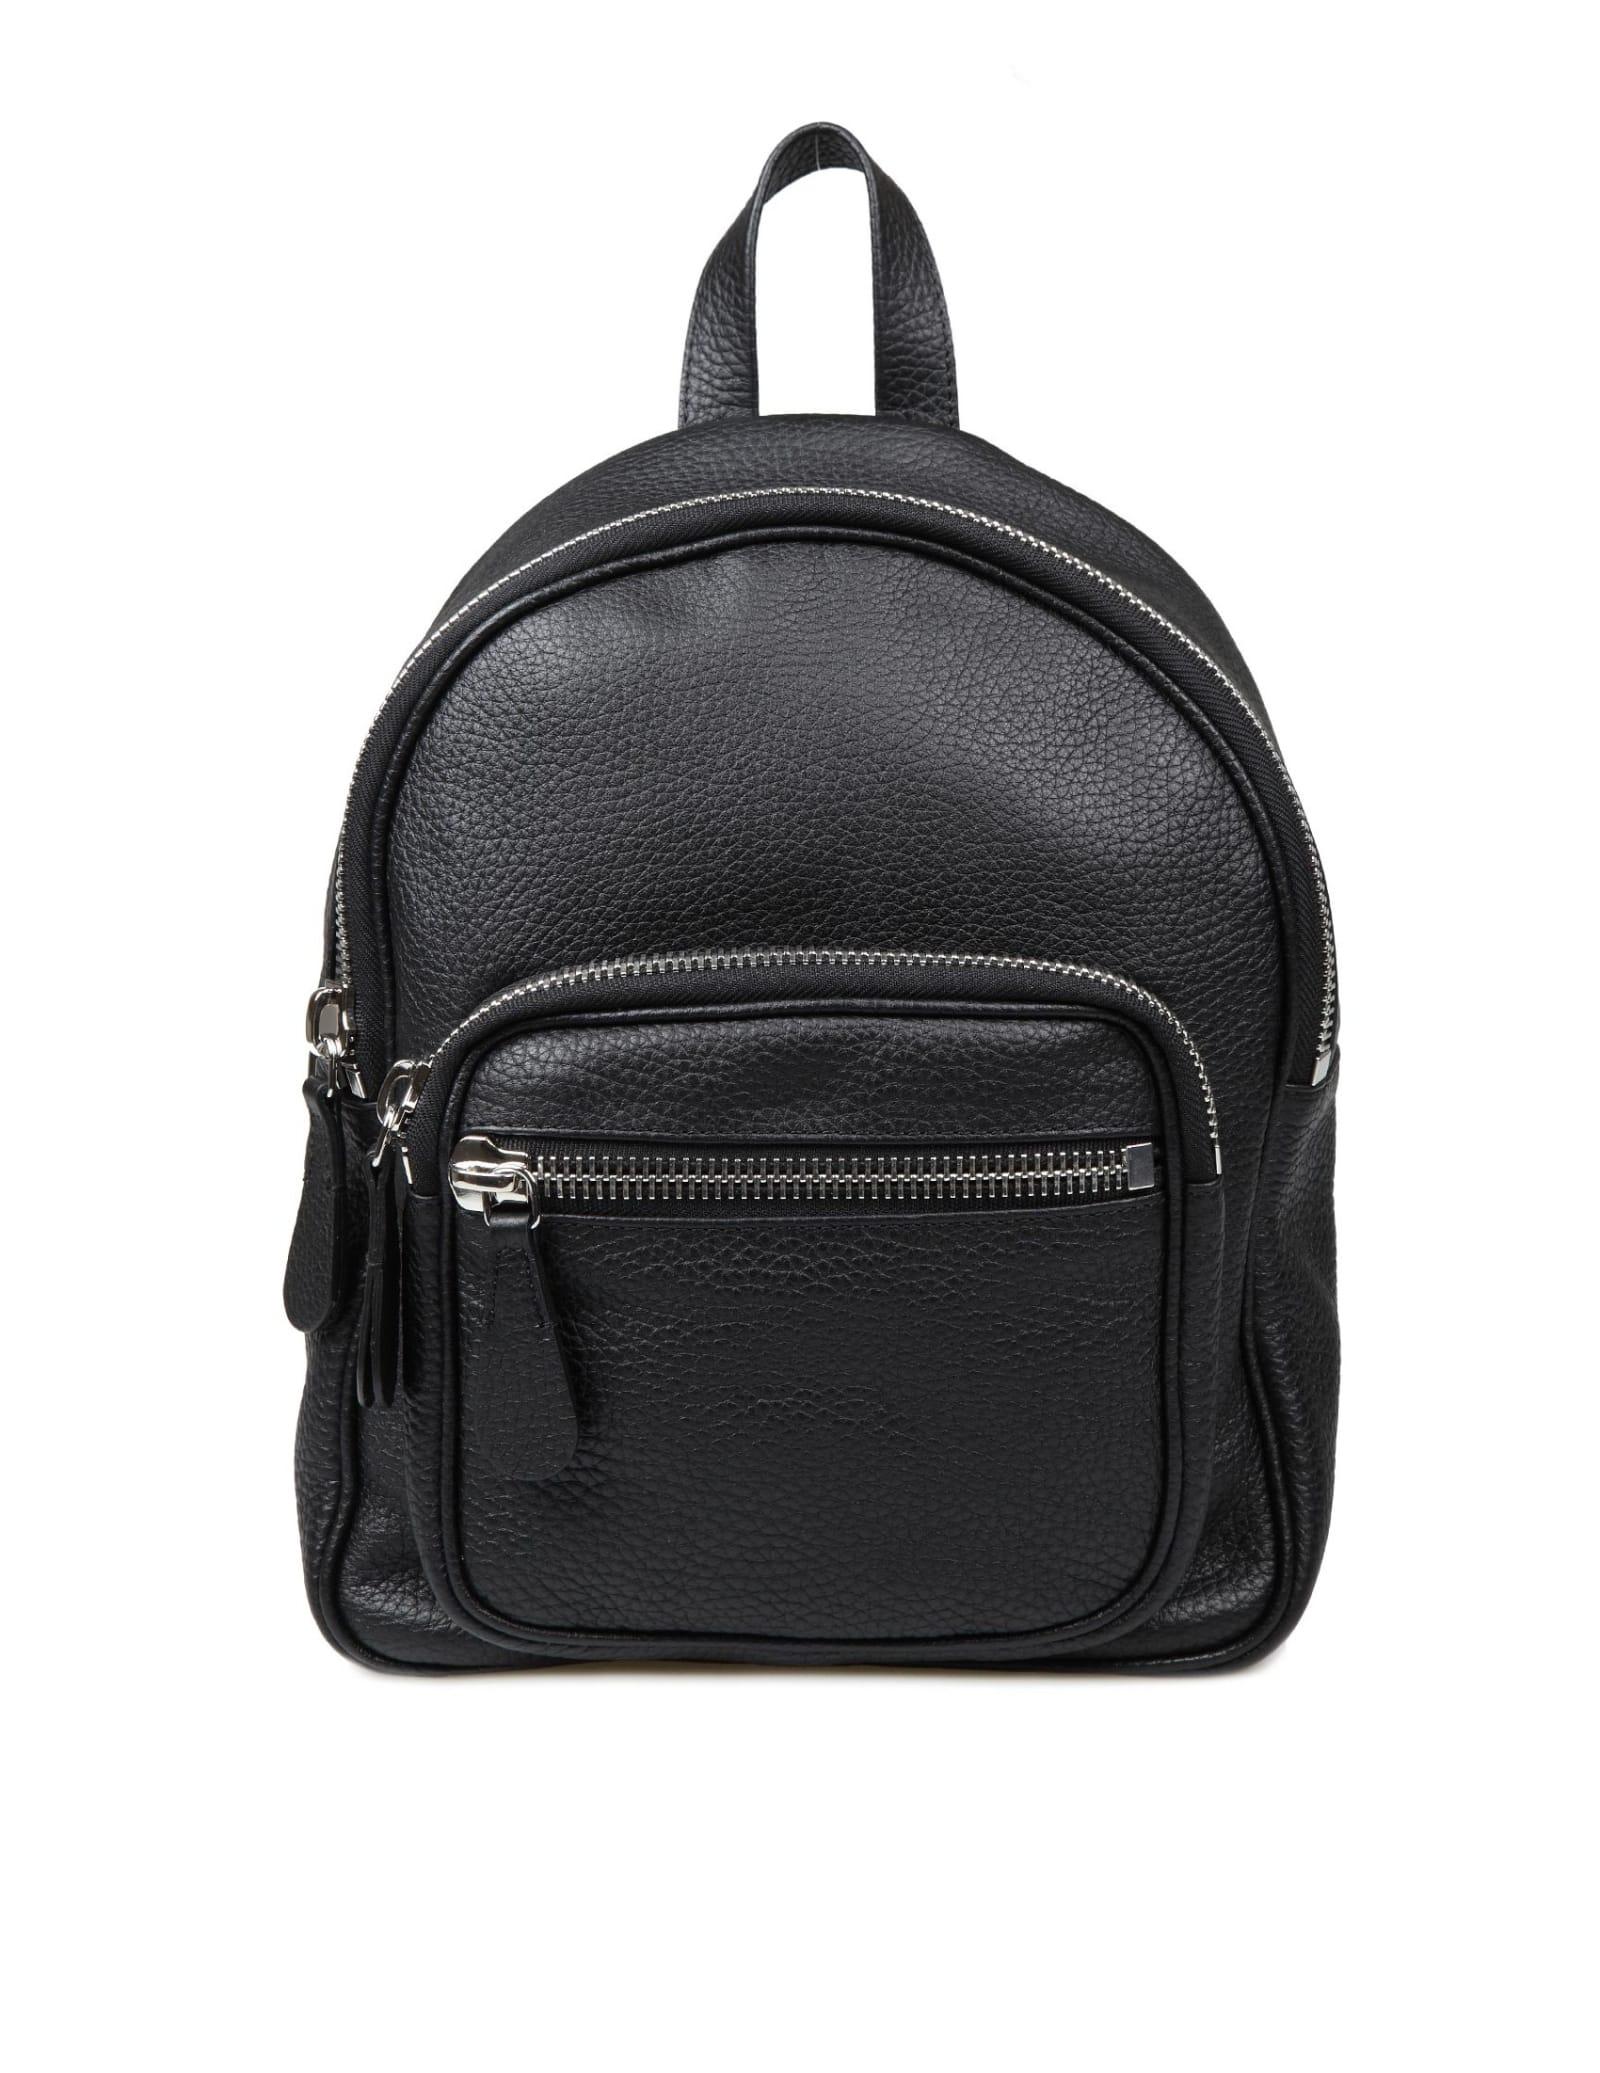 Maison Margiela Mini Backpack In Black Leather